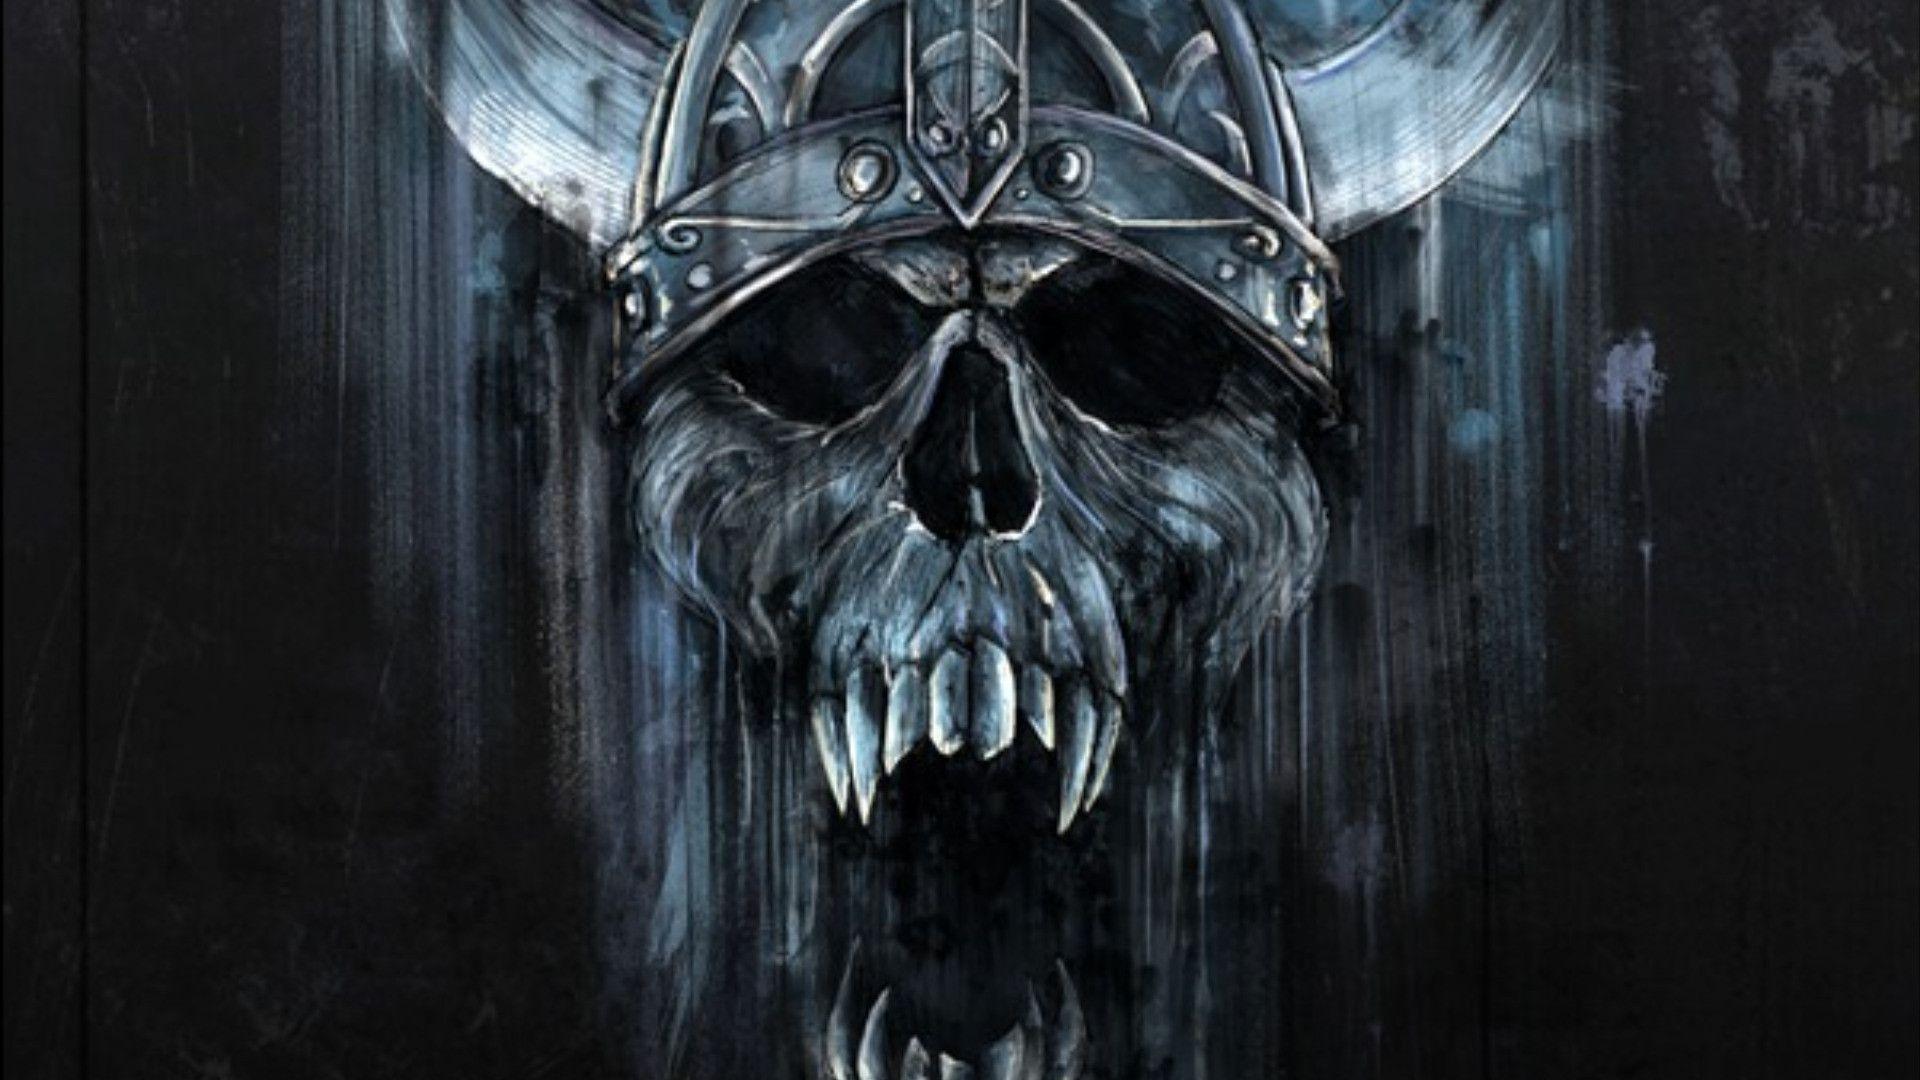 Best-Skull-ideas-on-Pinterest-Sugar-skull-wallpaper-wpc5802802